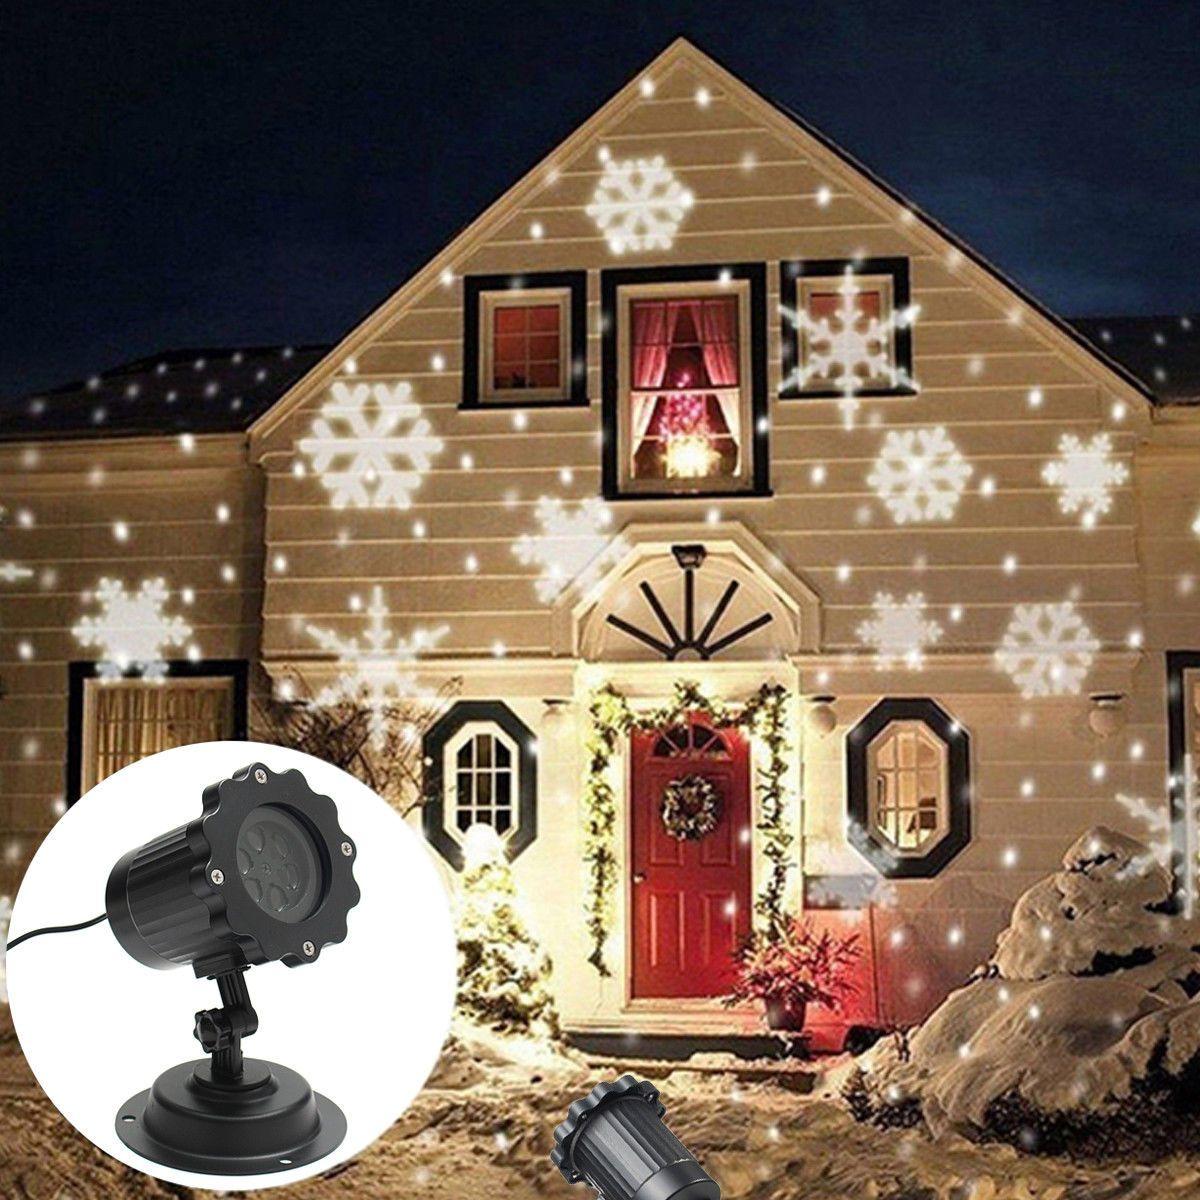 12 91 Outdoor Moving Laser Projector Led Light Snowflake Pattern Christmas 100 240v Ebay Home Garden Exterior Christmas Lights Christmas Light Projector Christmas Projector